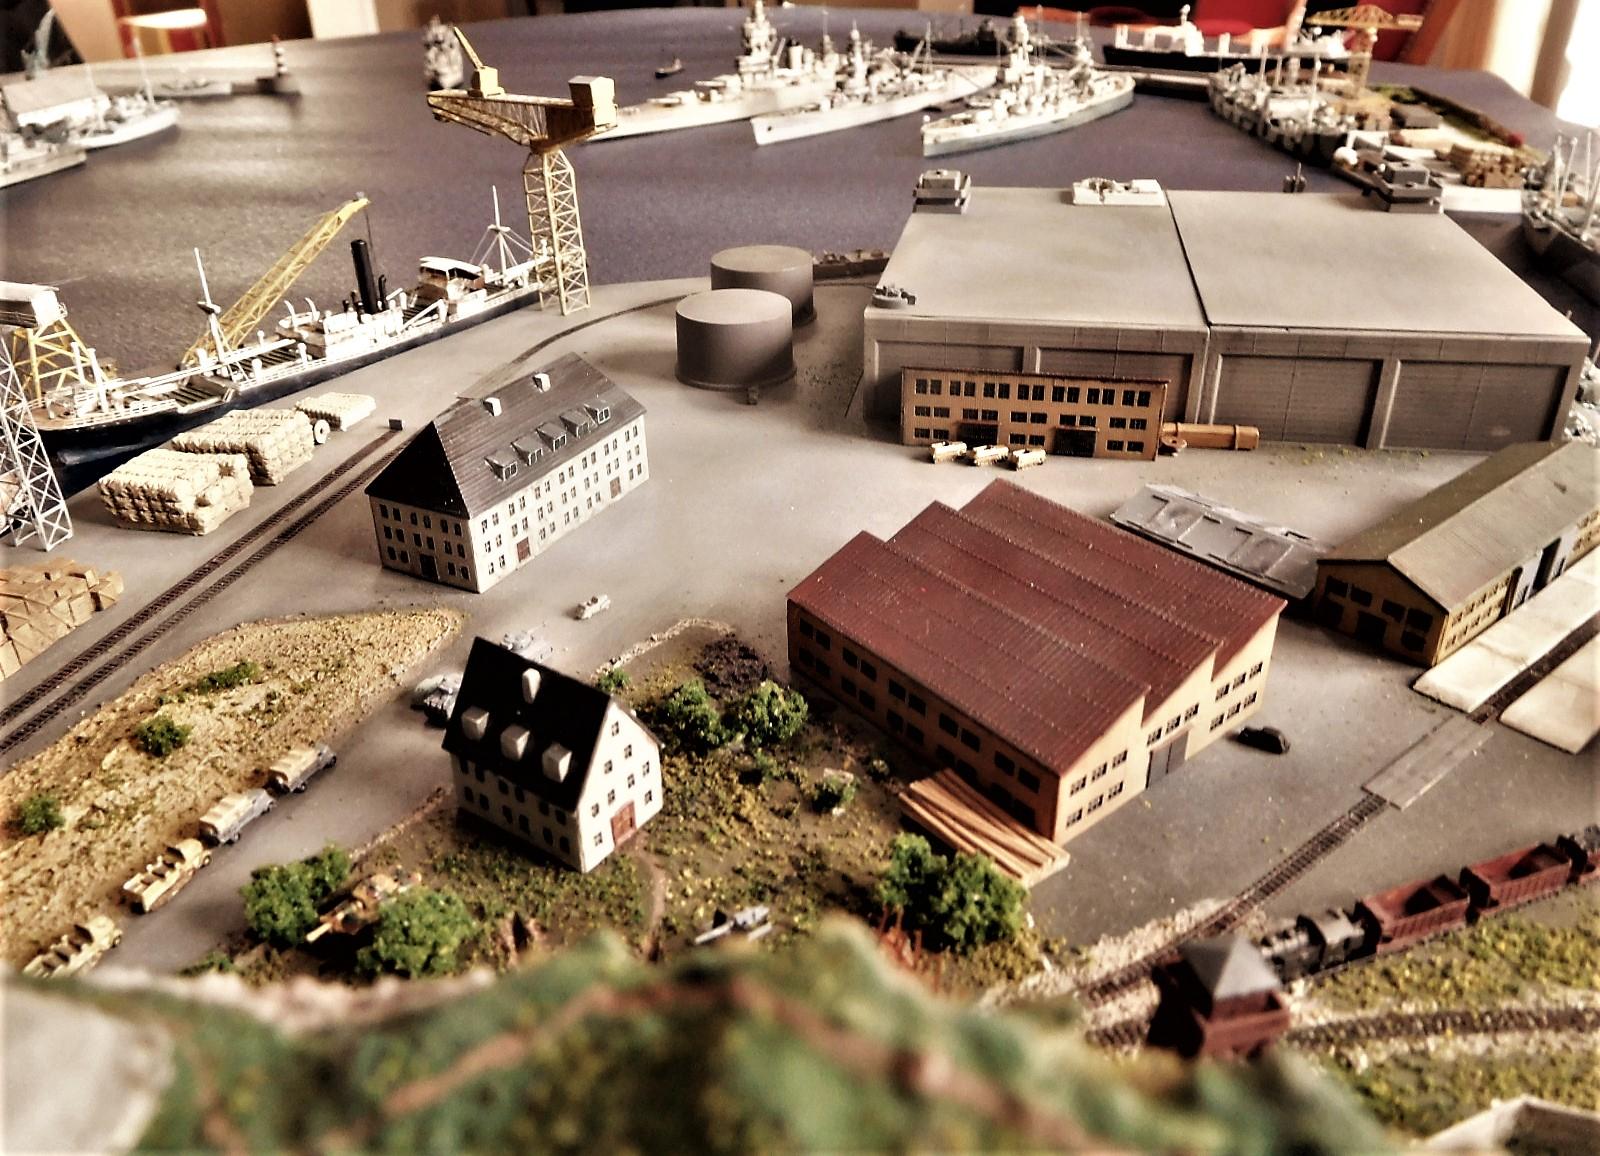 Diorama base navale 1/700 par Nesquik - Page 4 YhsV